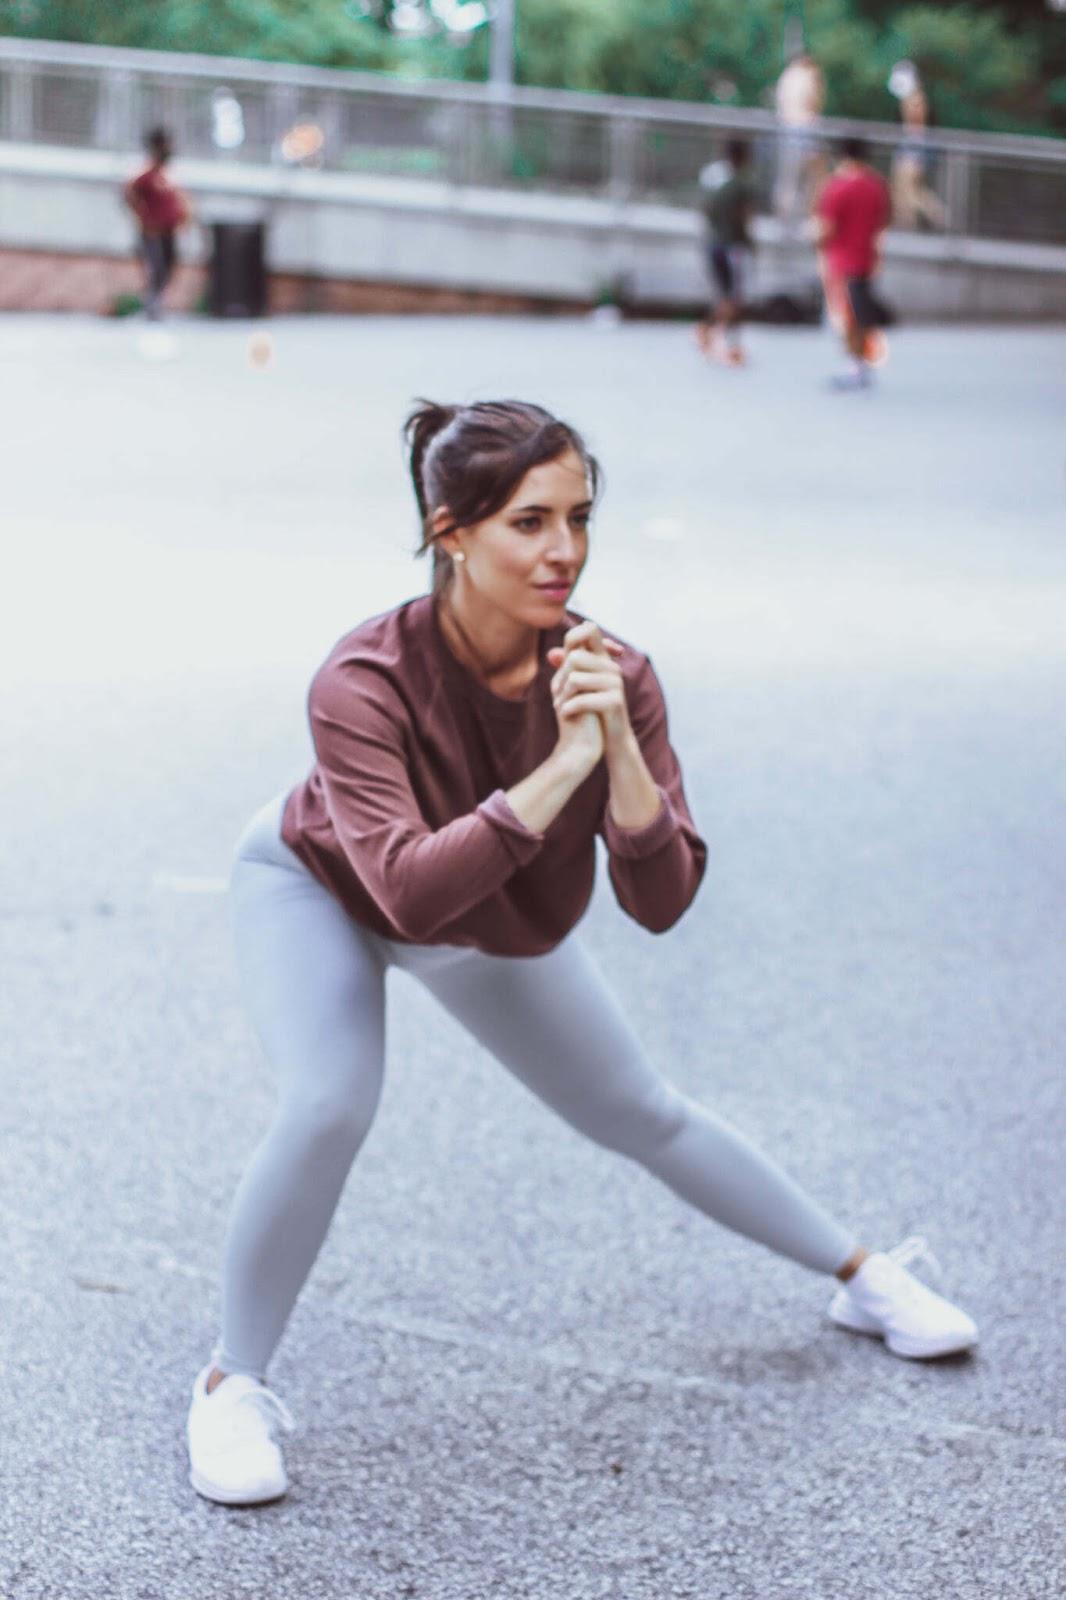 Serena Scanzillo of SerenaFit online fitness trainer